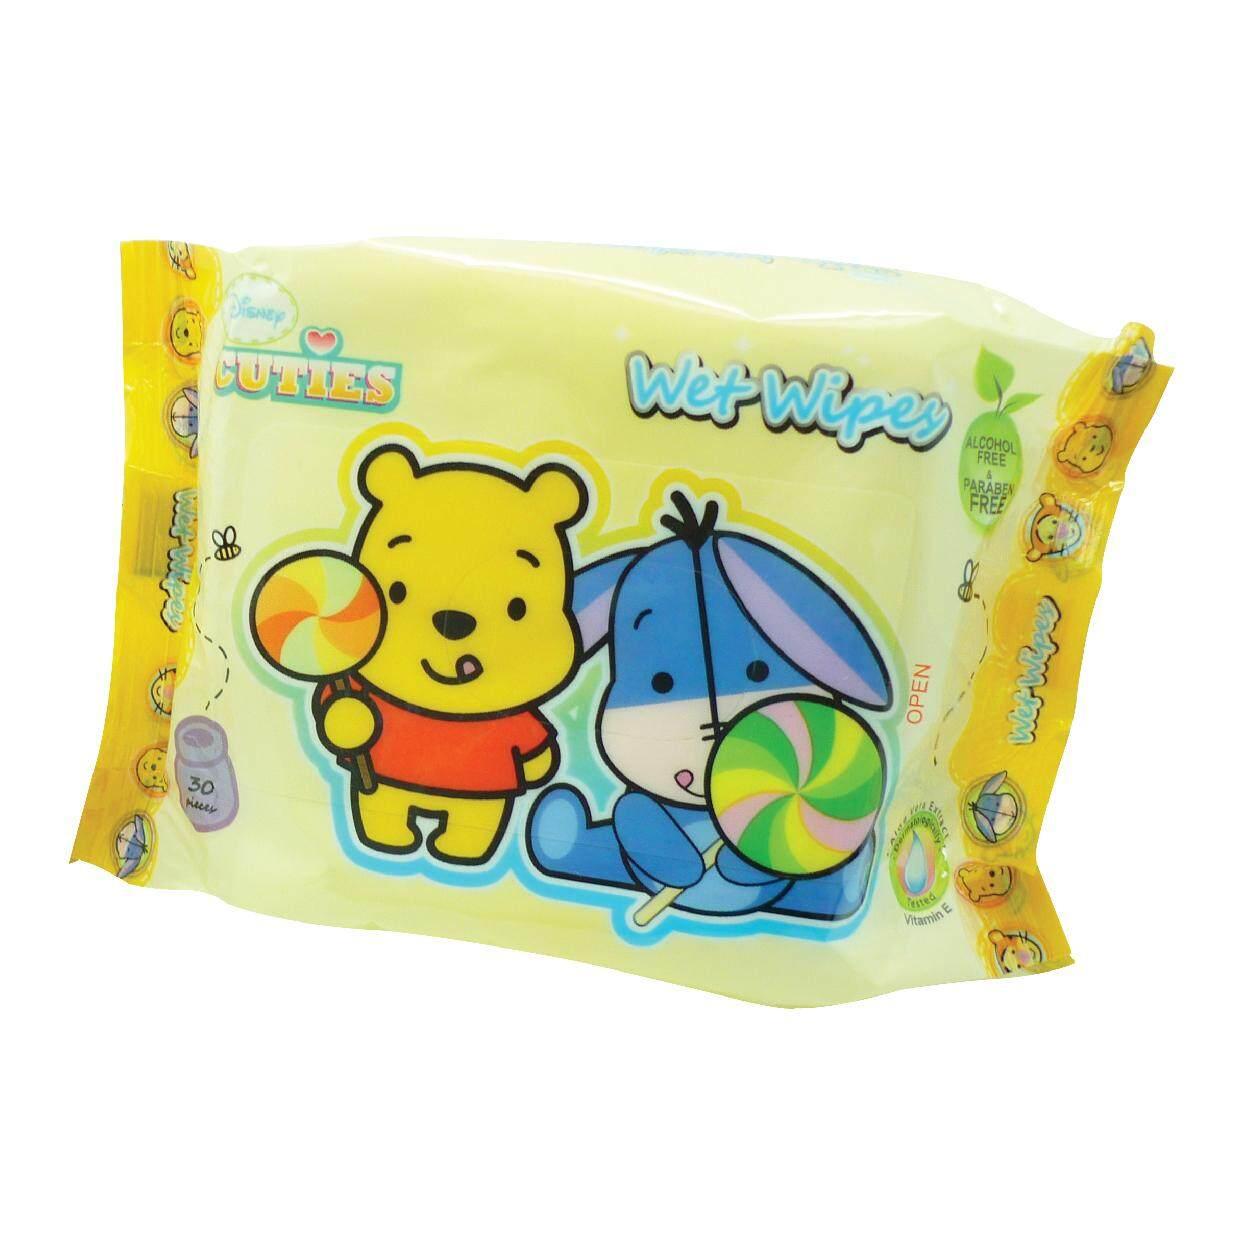 Disney Cuties Wet Wipes (Tigger & Pooh) 30's